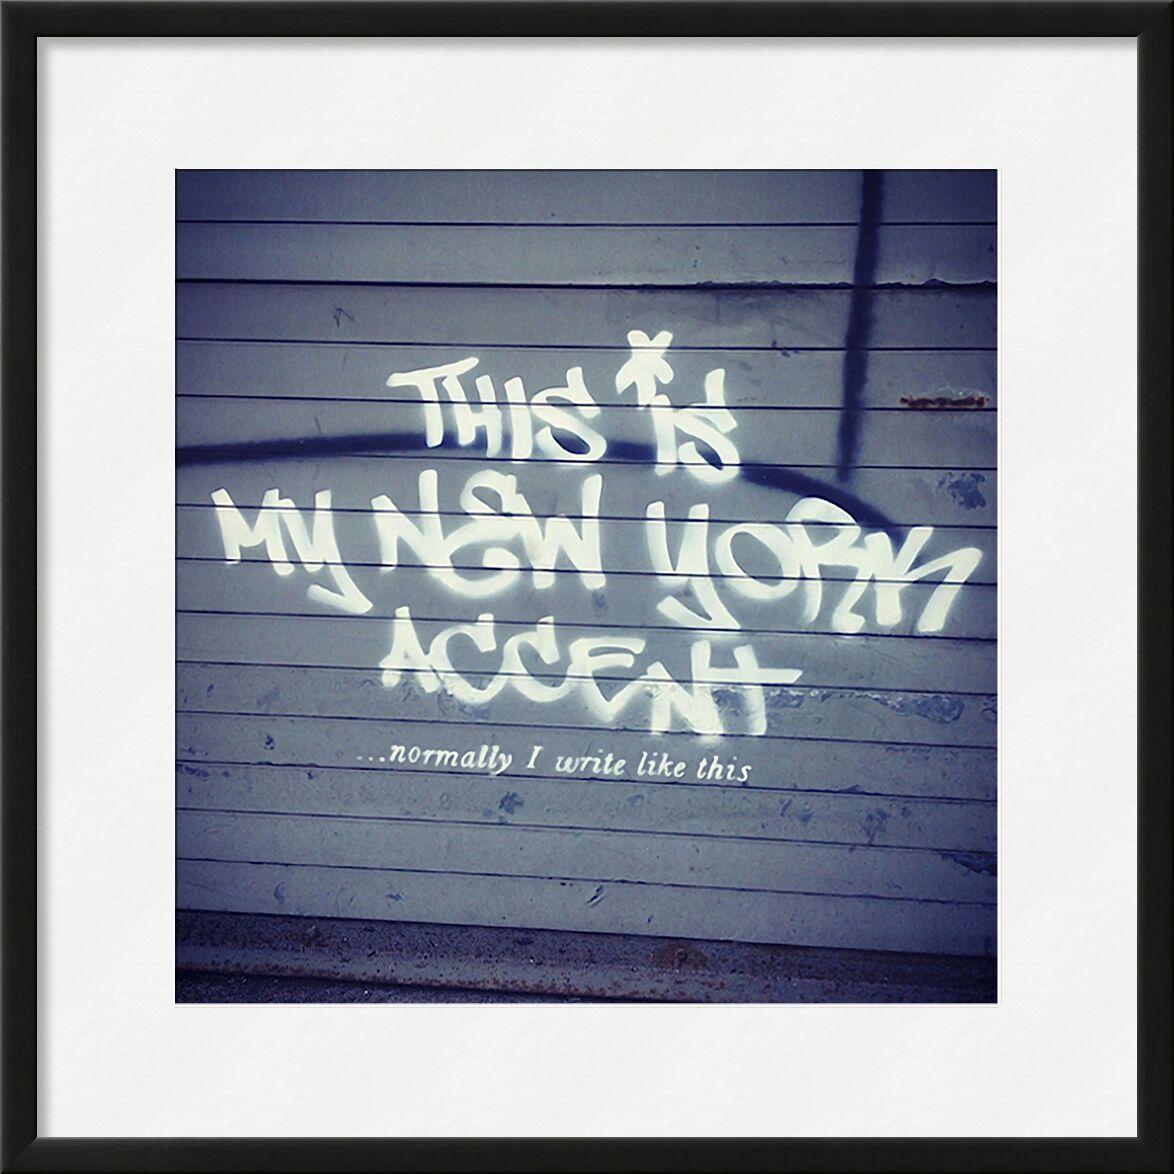 My New York Min - BANKSY de AUX BEAUX-ARTS, Prodi Art, min, accent, art de rue, New York, Banksy